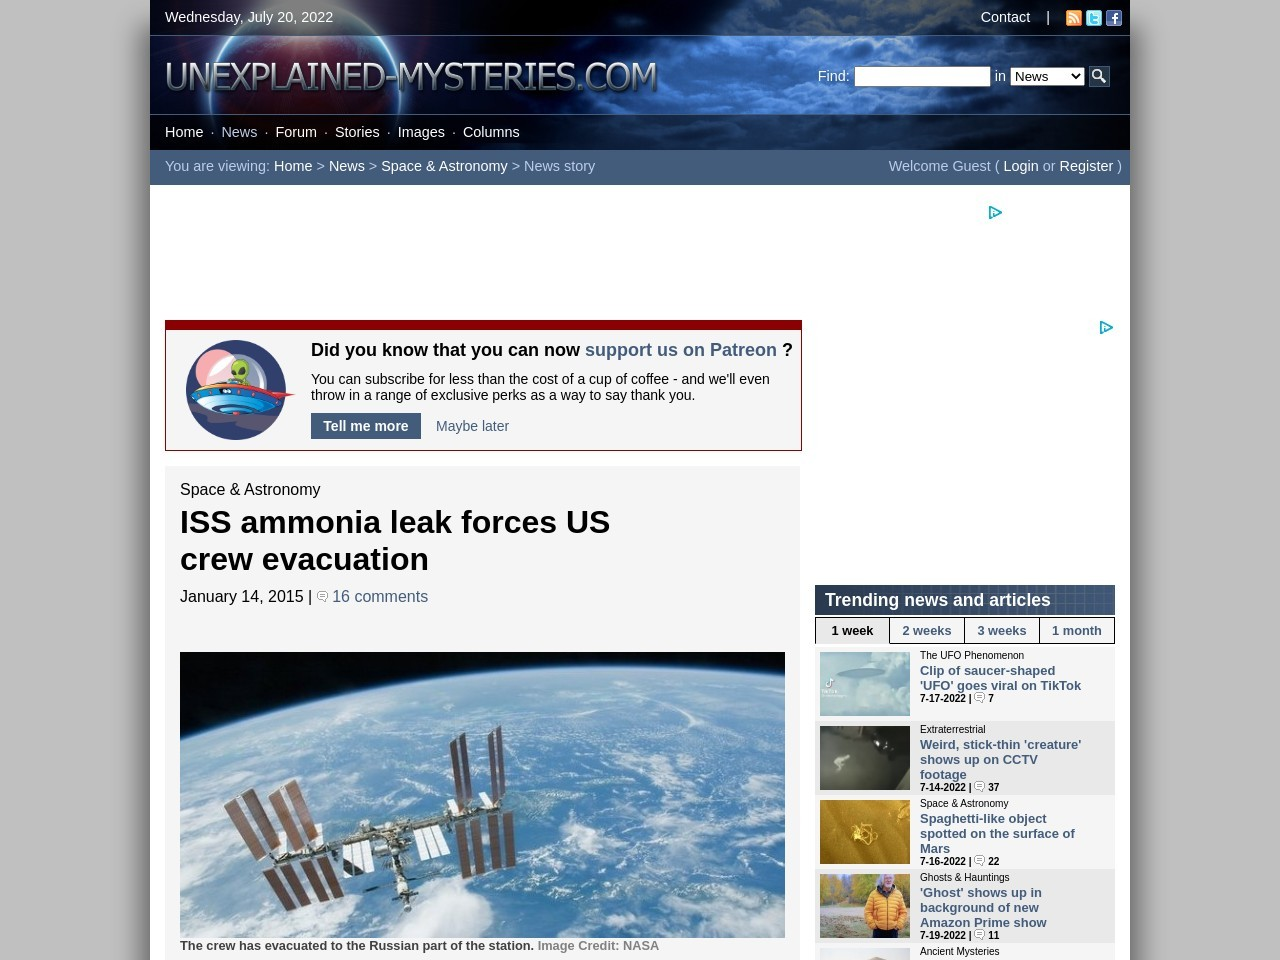 ISS ammonia leak forces US crew evacuation